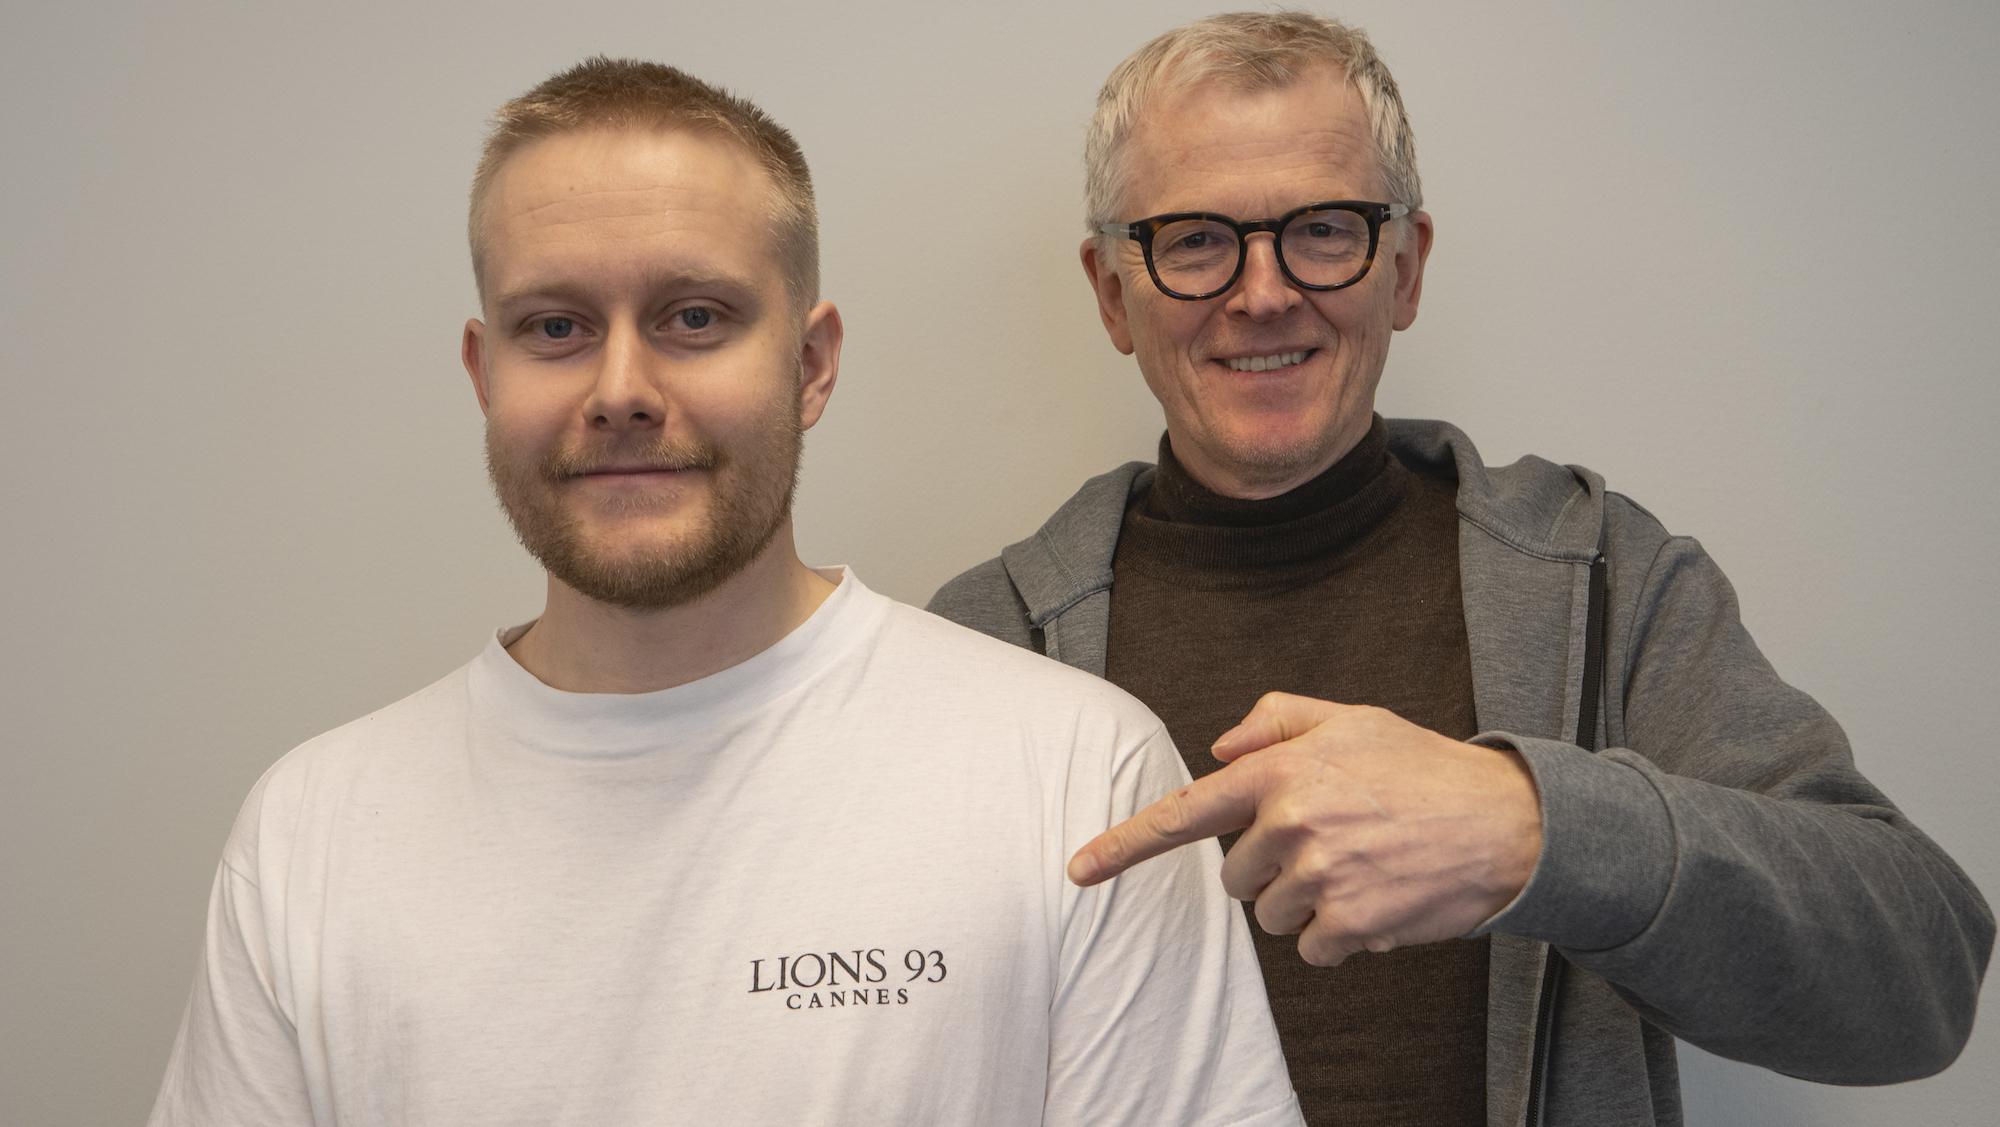 Martin og Thorbjørn.